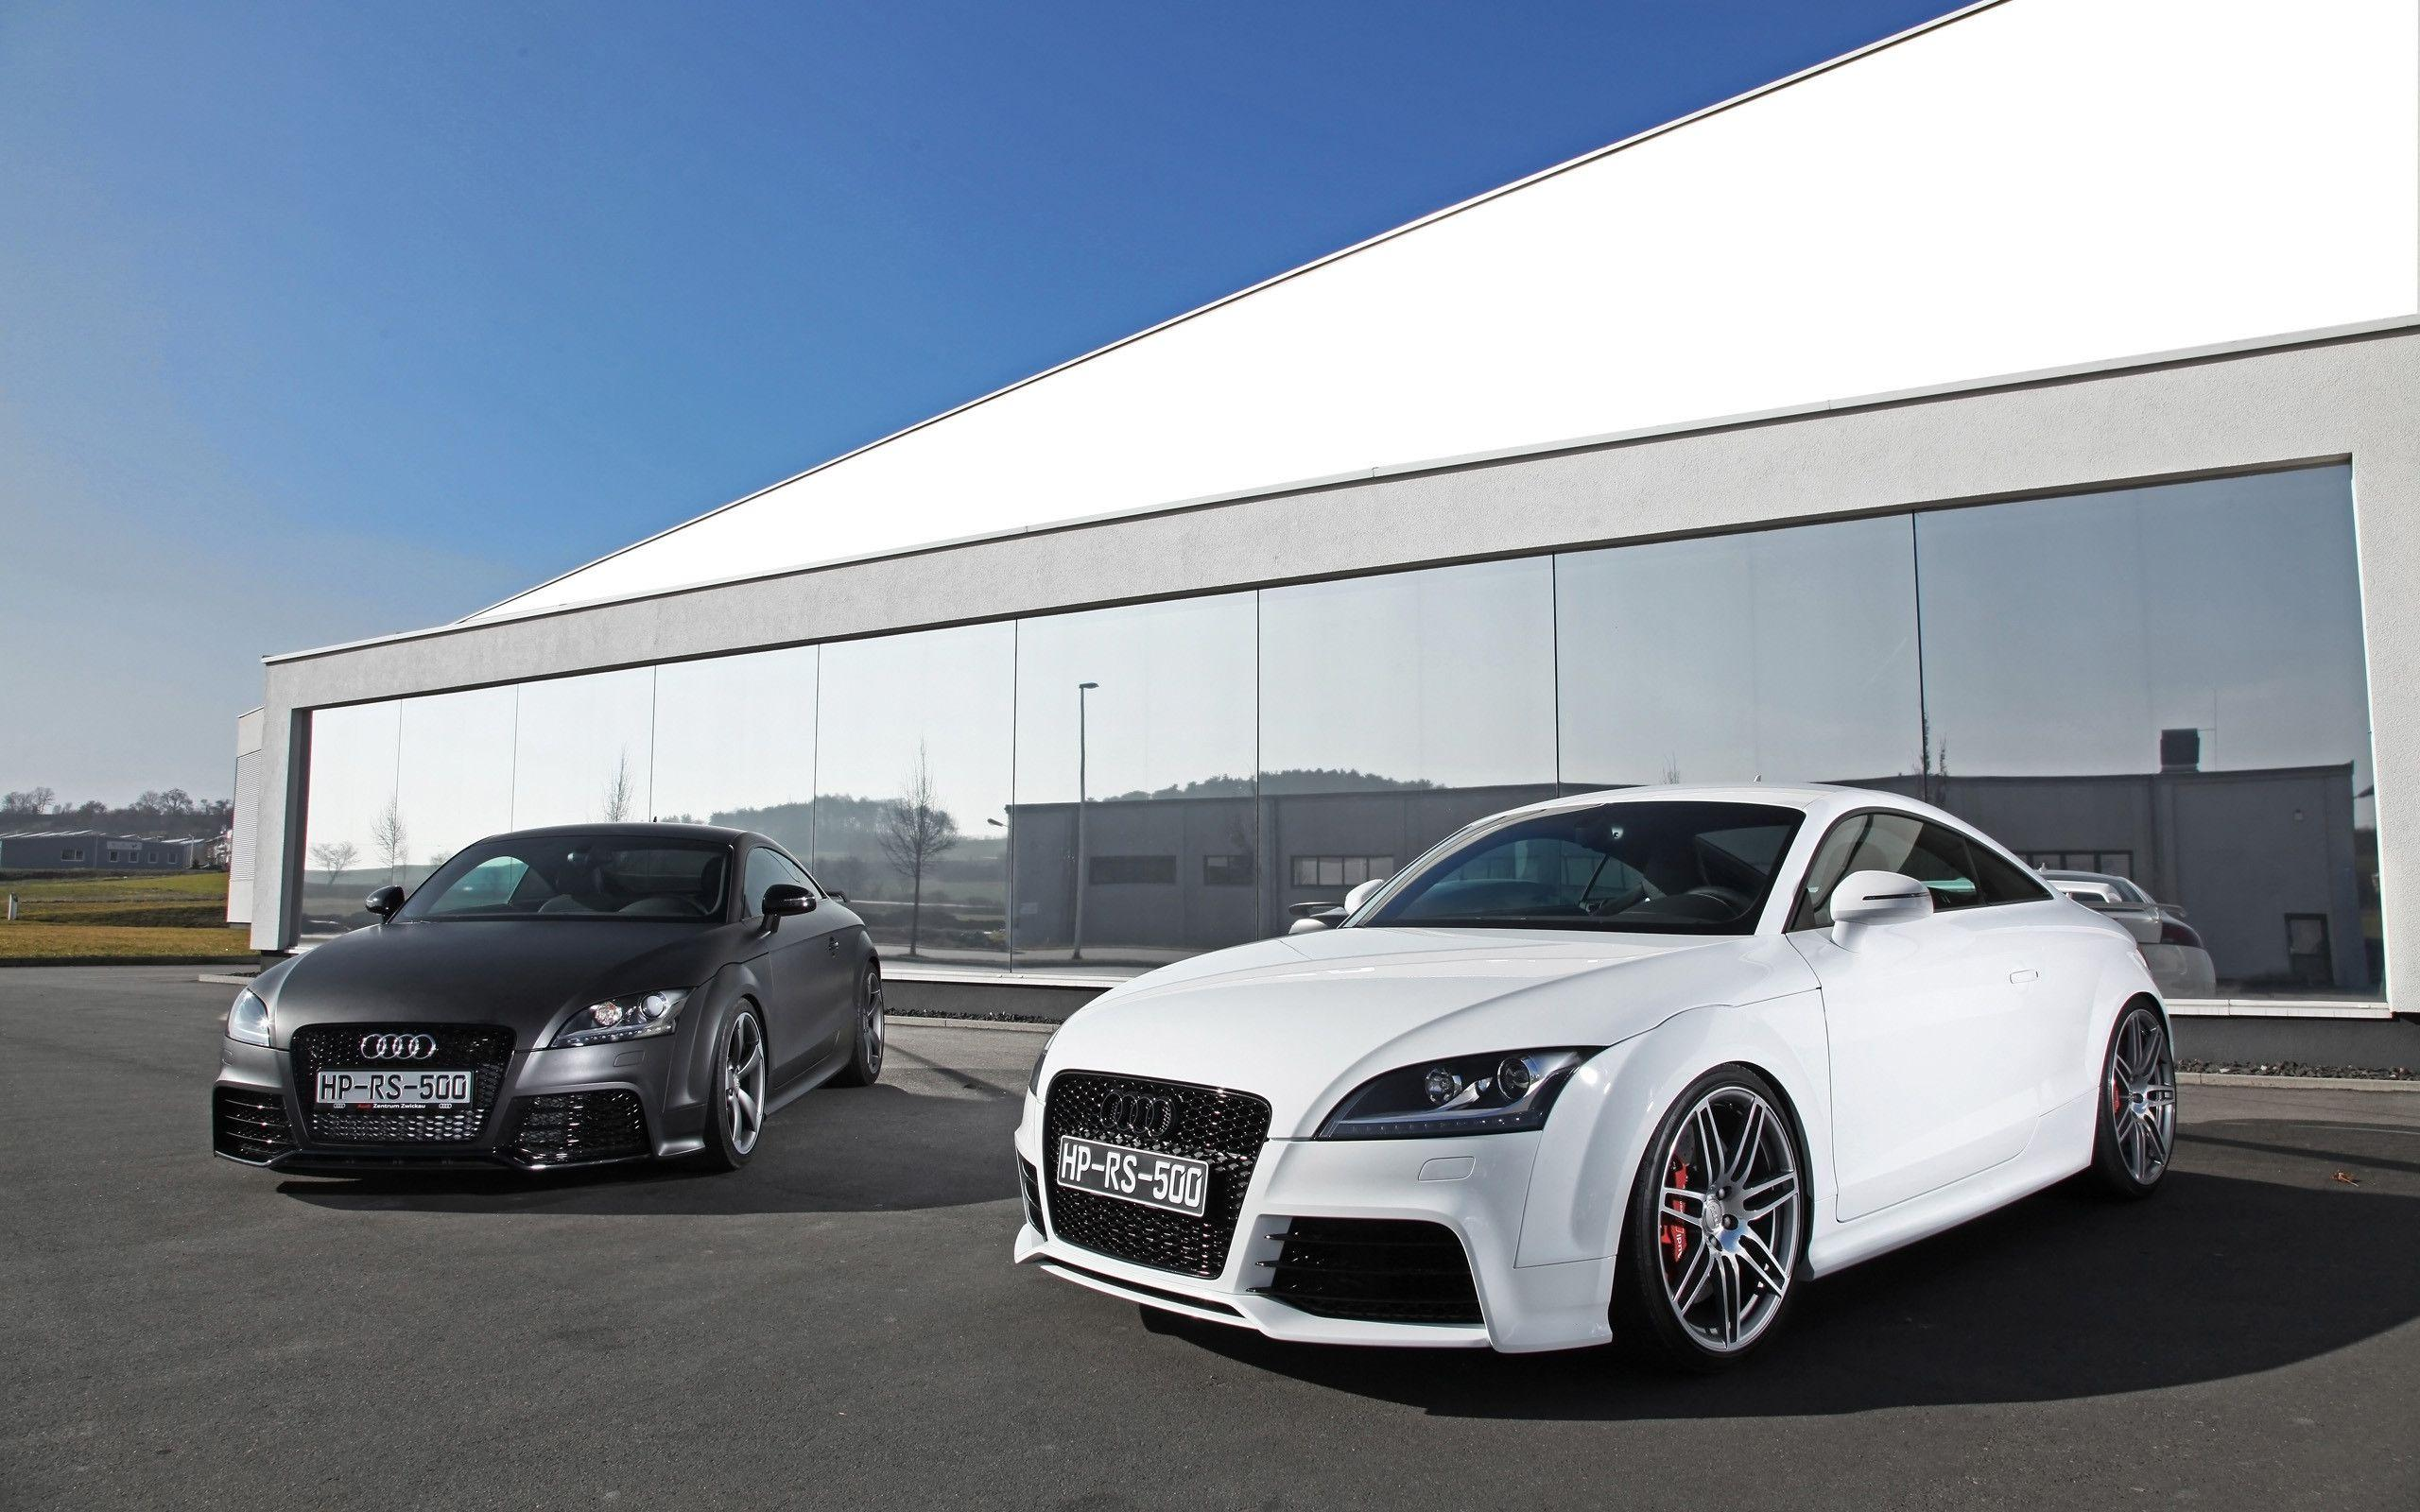 Audi TT Wallpapers 2560x1600